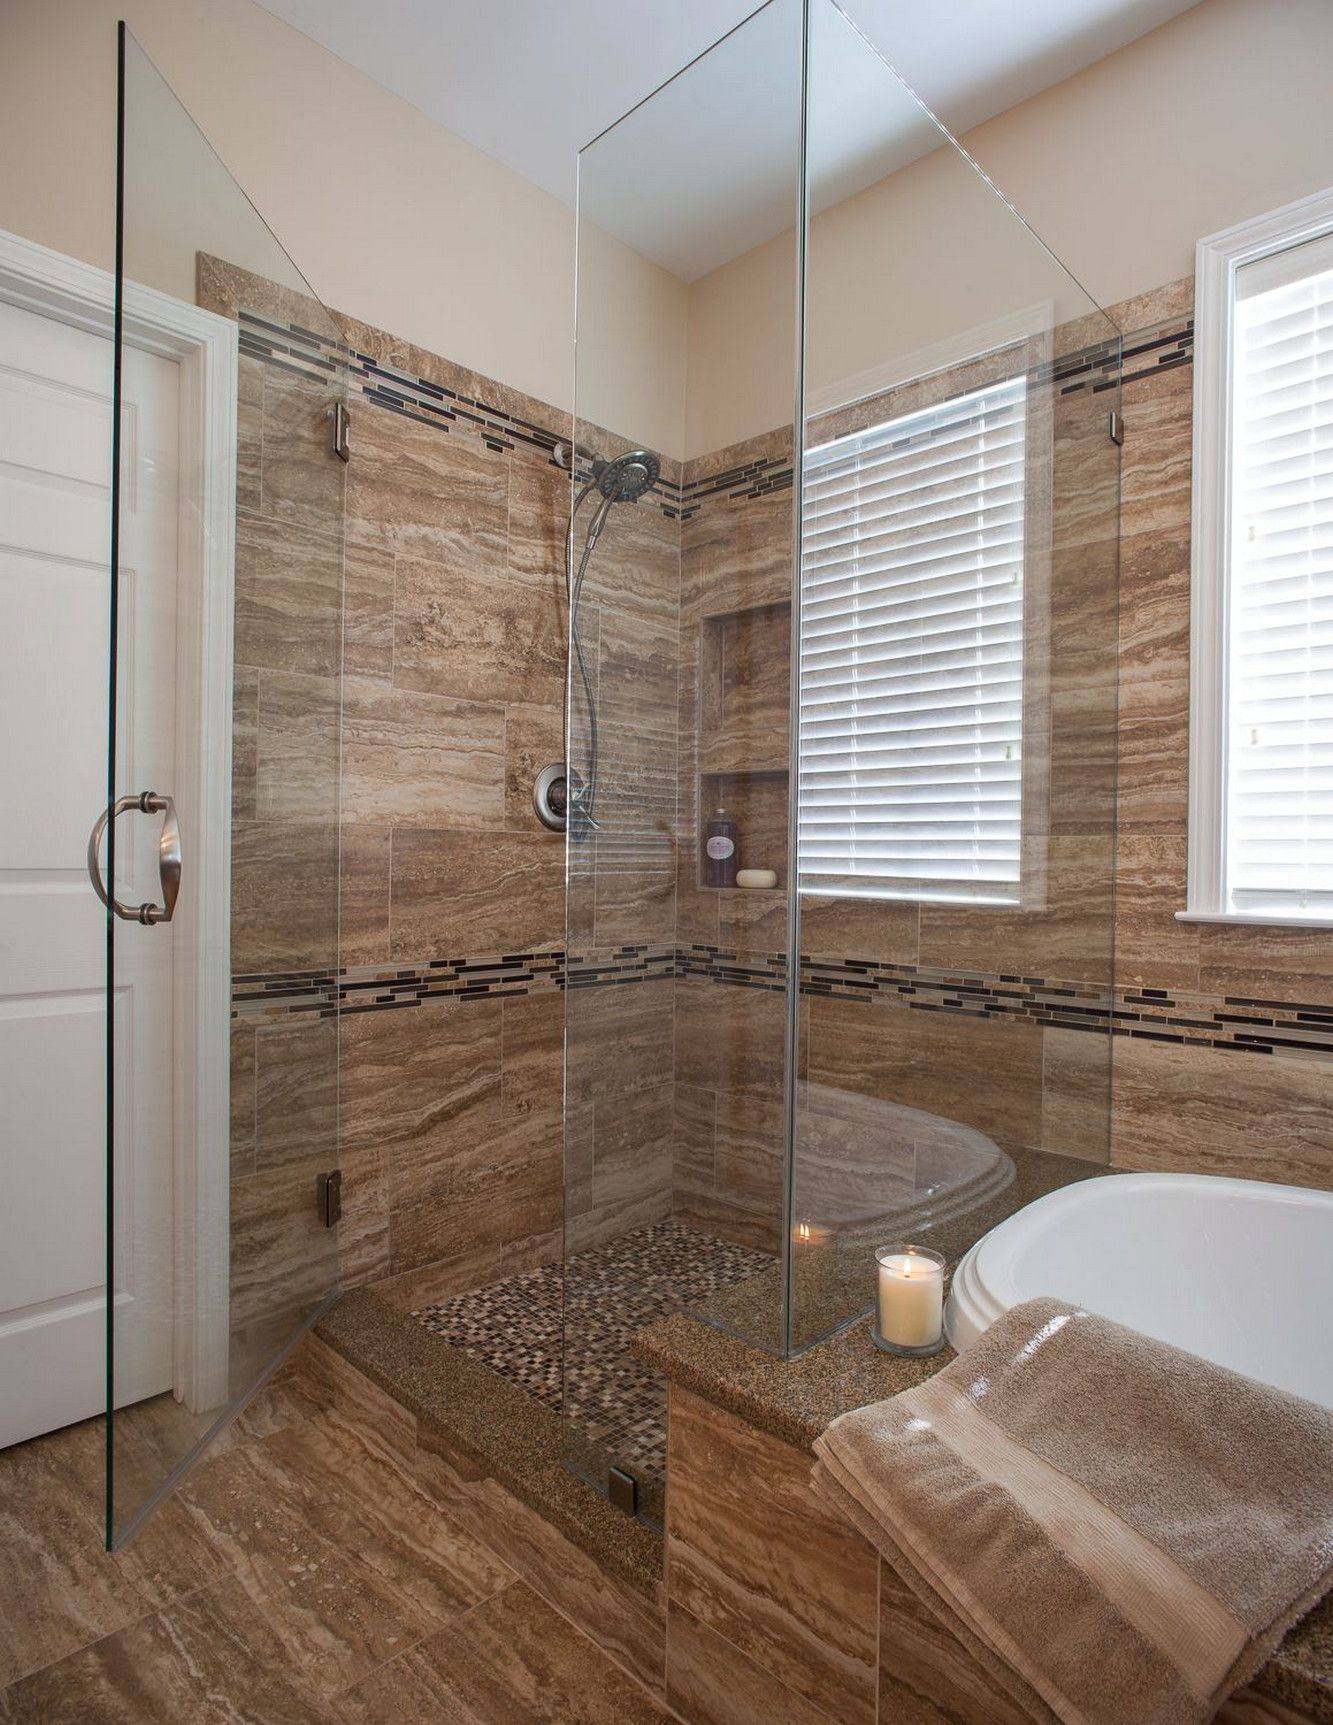 Simple Bathroom Design Ideas Without Bathtub Interior Design Bathroom Small Bathroom Layout Bathroom Interior Design